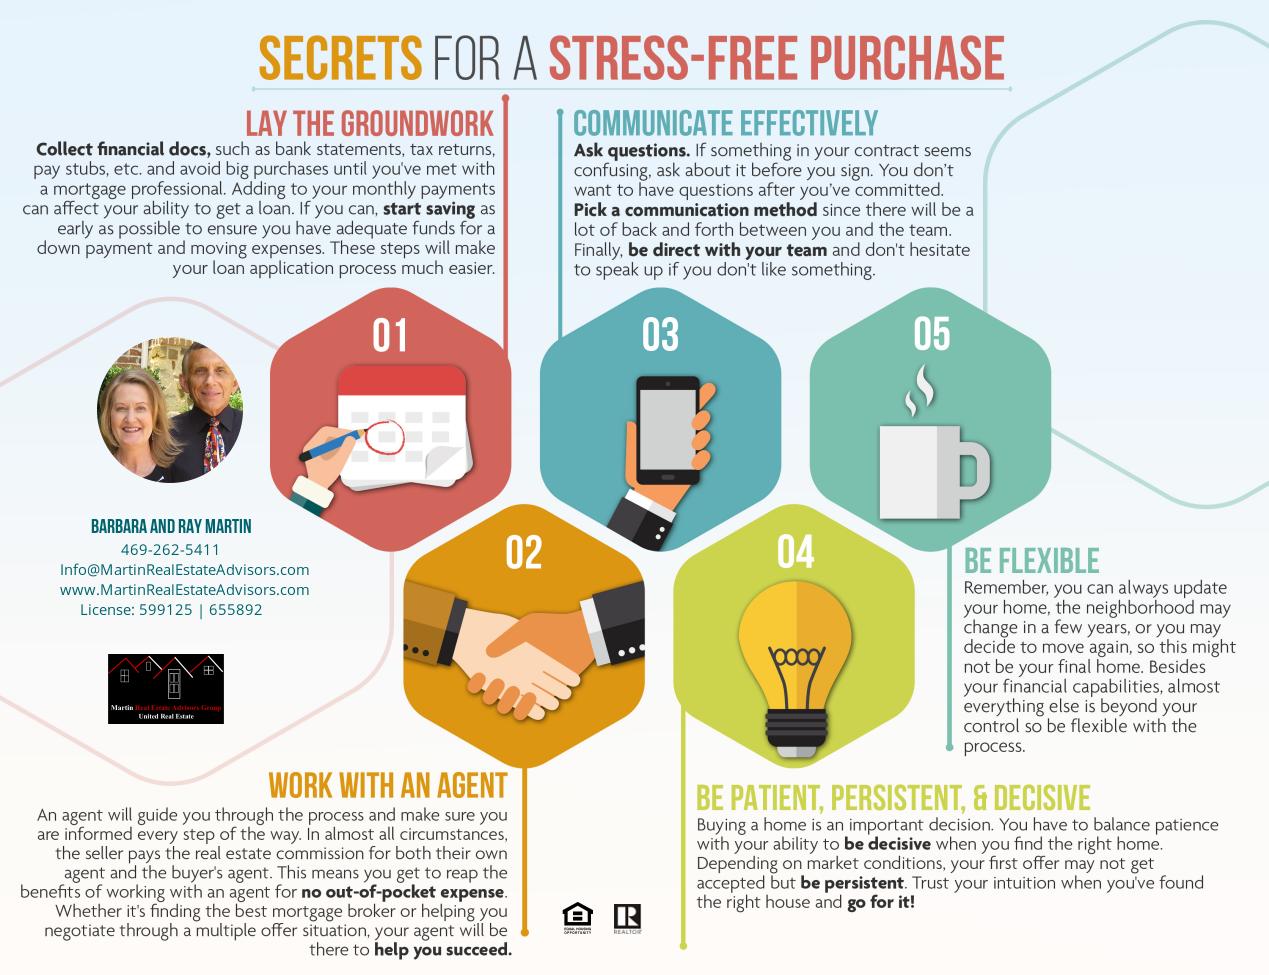 Secrets for a Stress-Free Transaction